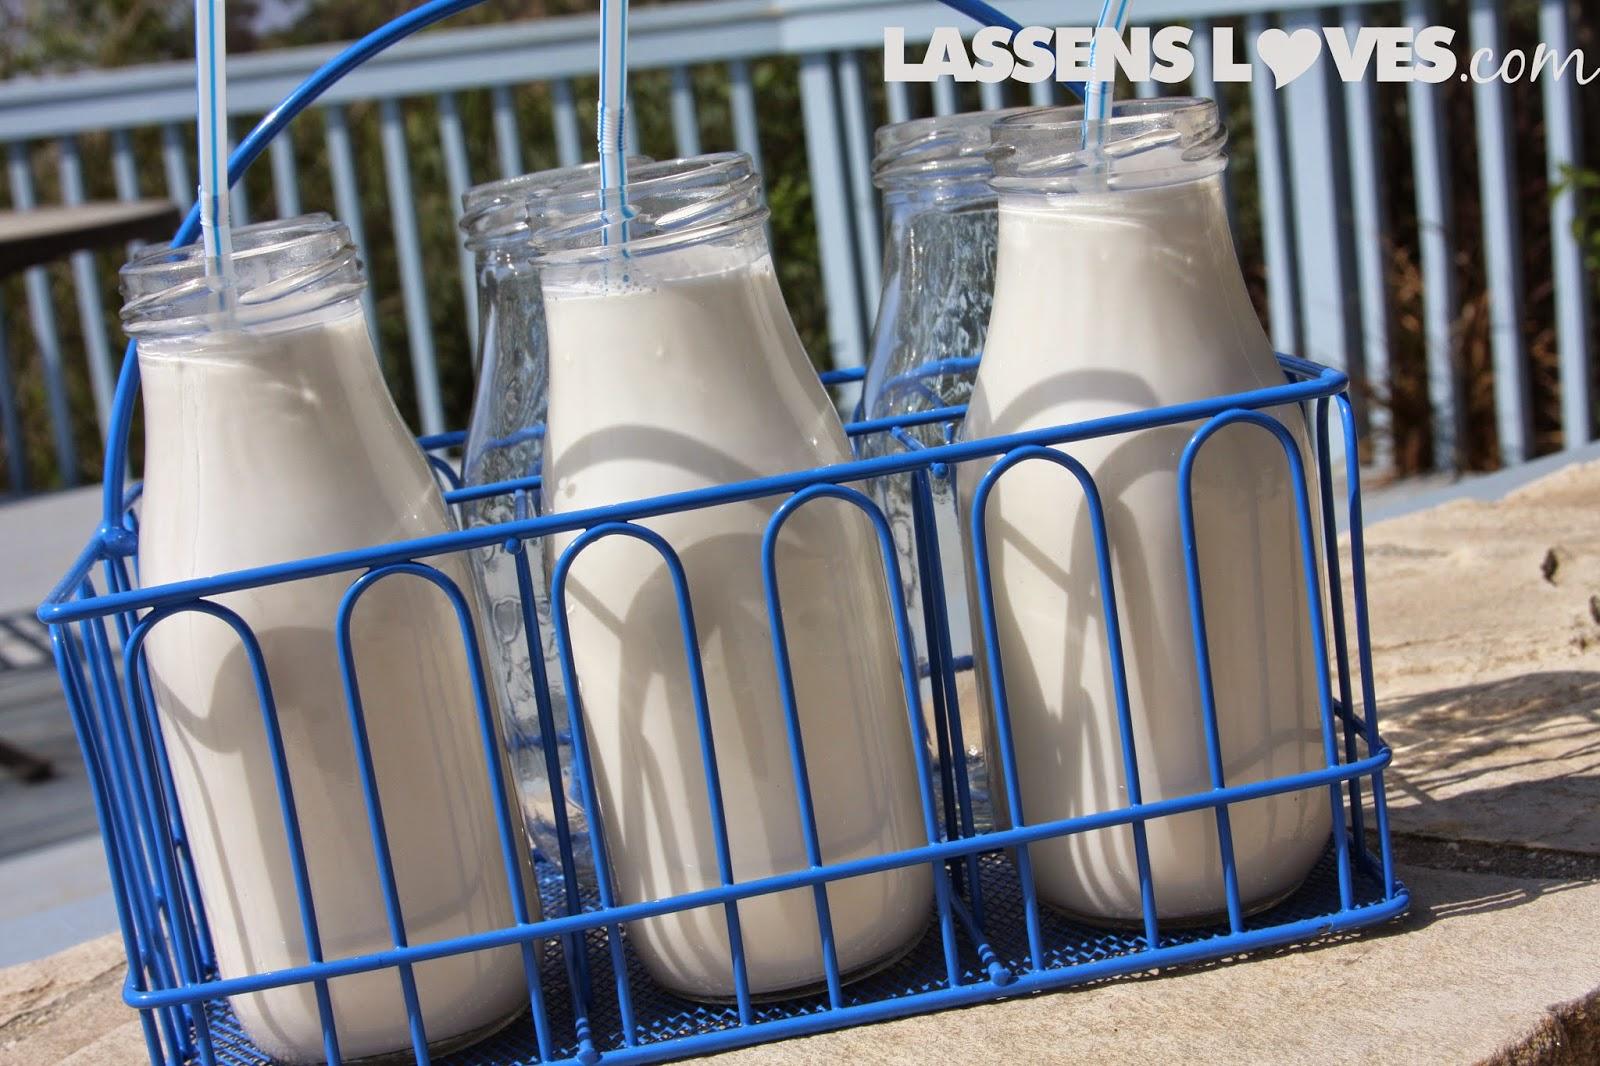 how+to+make+almond+milk, almond+milk, diy+almond+milk